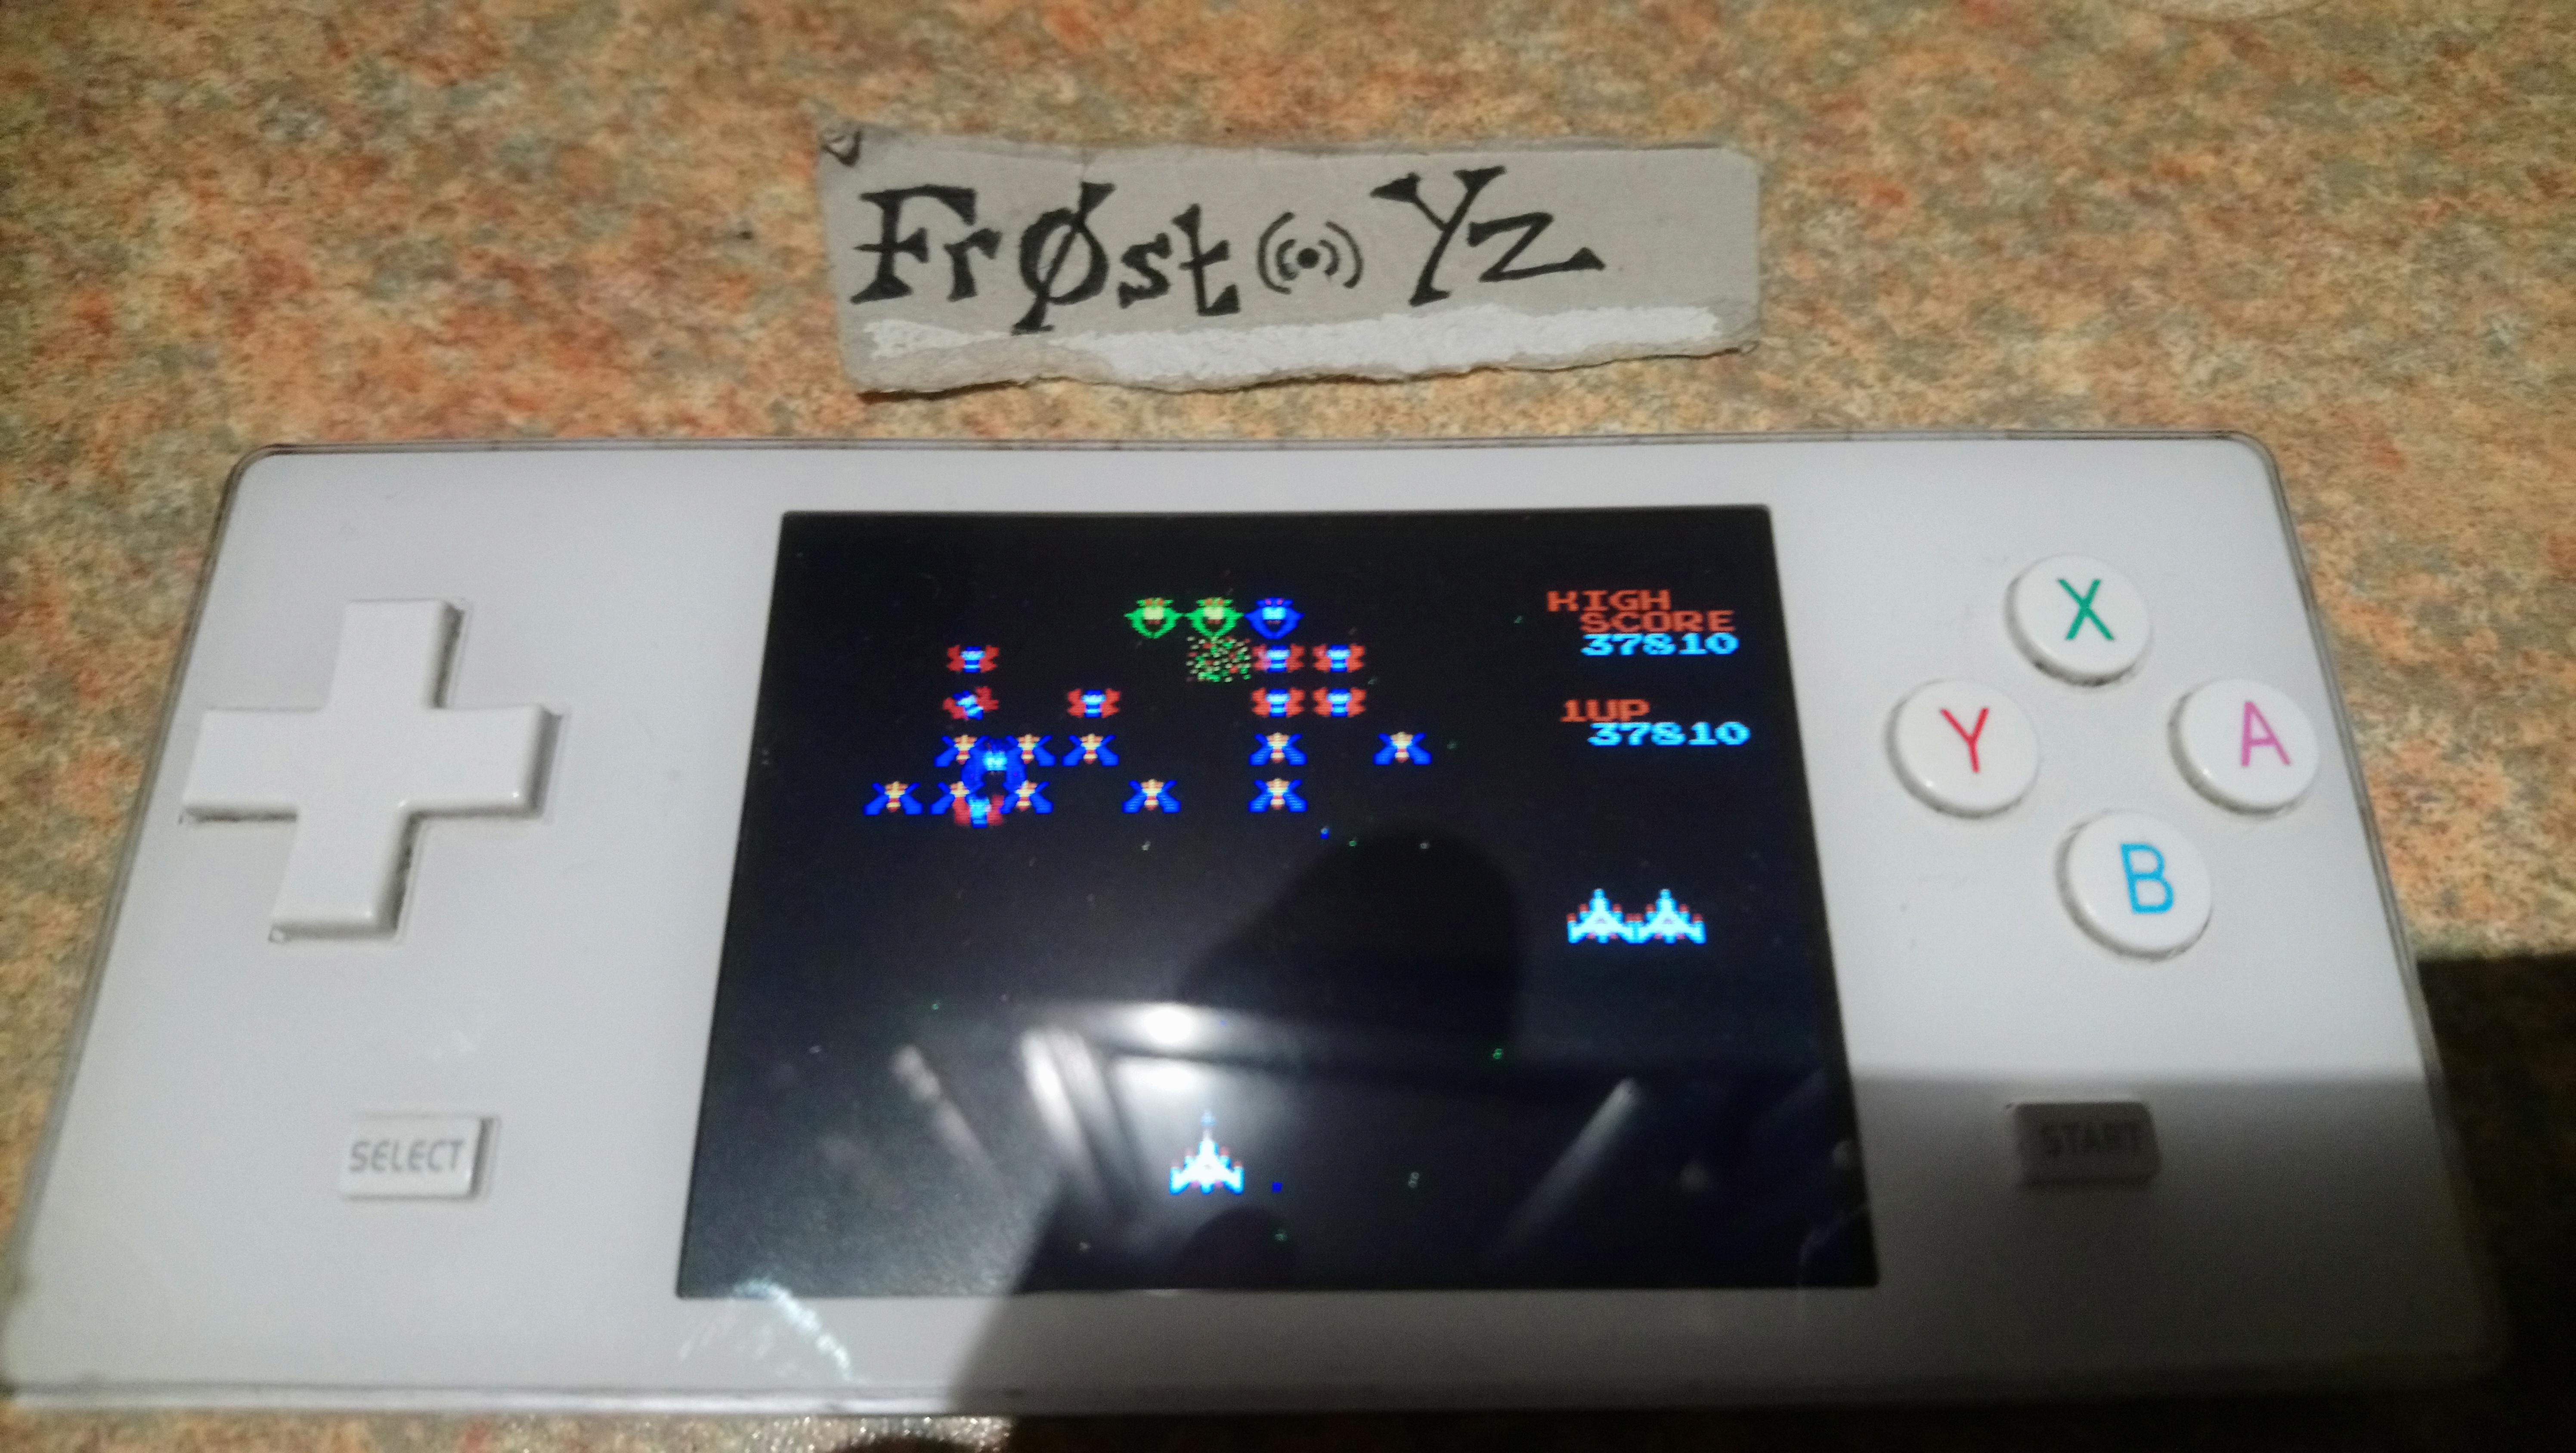 Fr0st: Galaga (NES/Famicom Emulated) 37,810 points on 2019-02-06 14:49:27